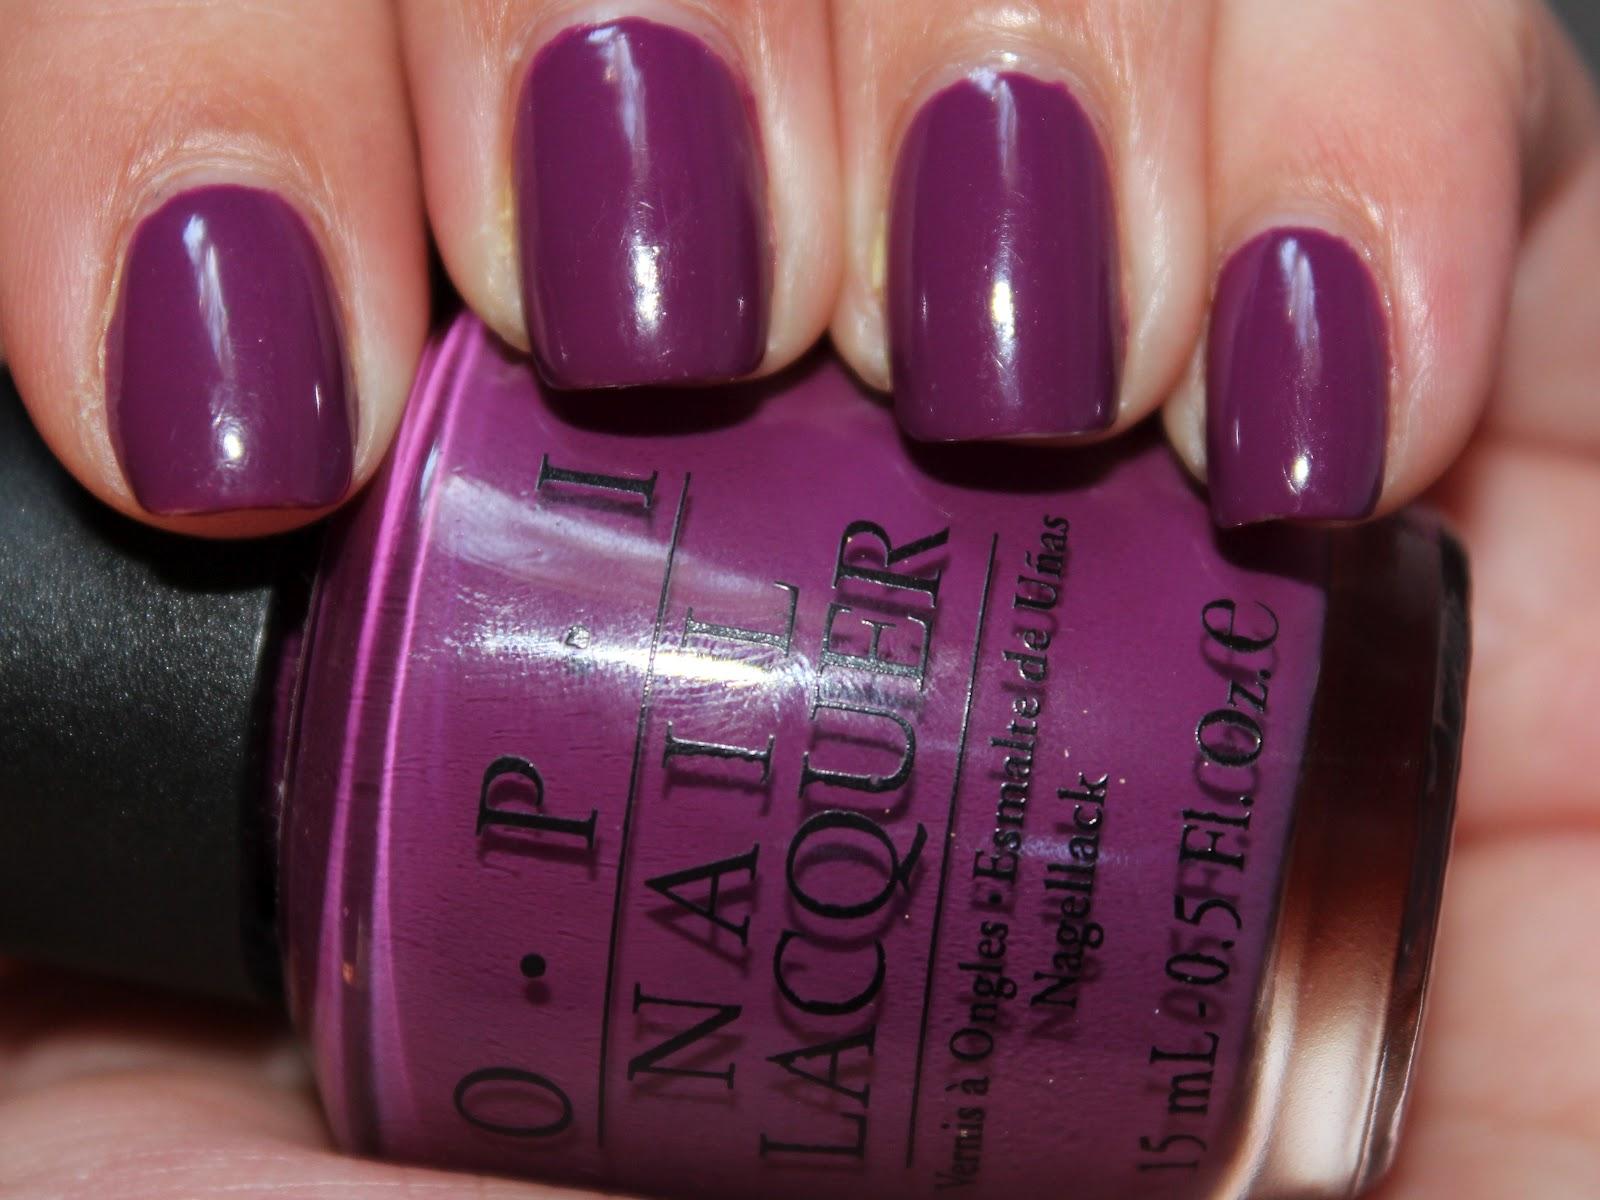 Light Purple Nail Polish Opi Opi s espana collection was